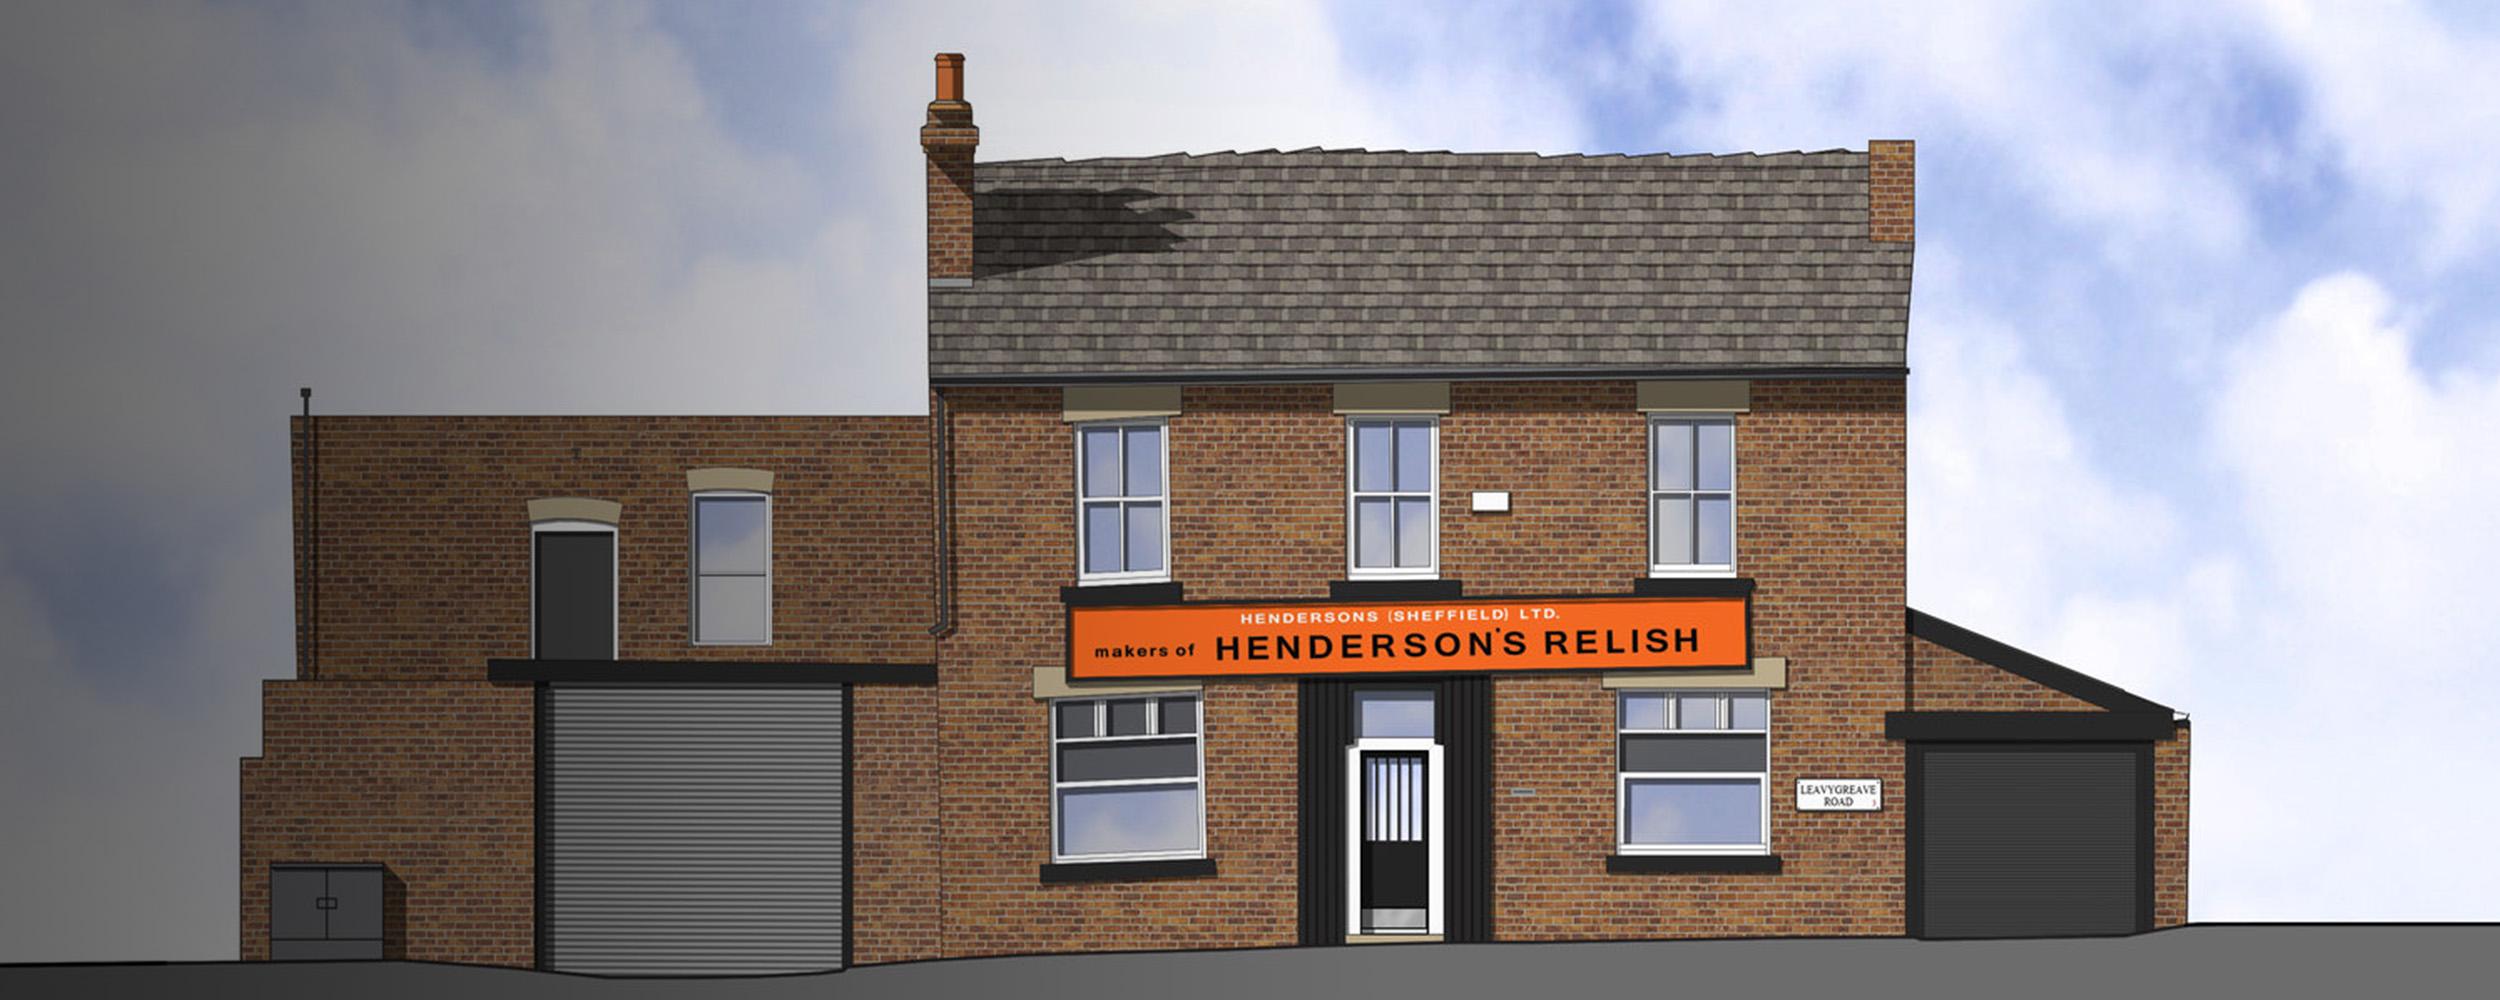 Hendersons Relish